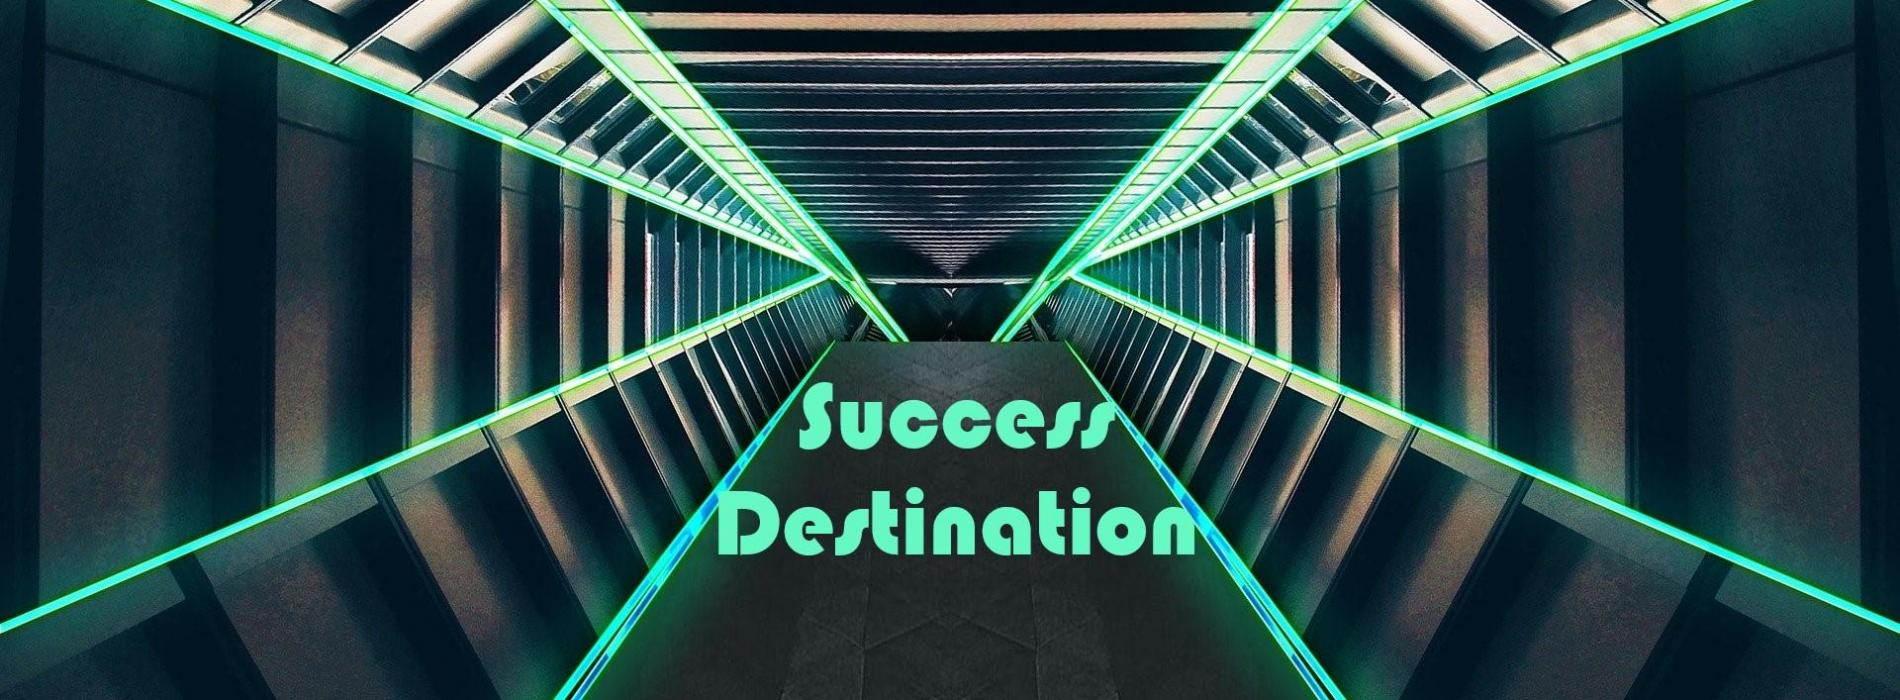 Success destination